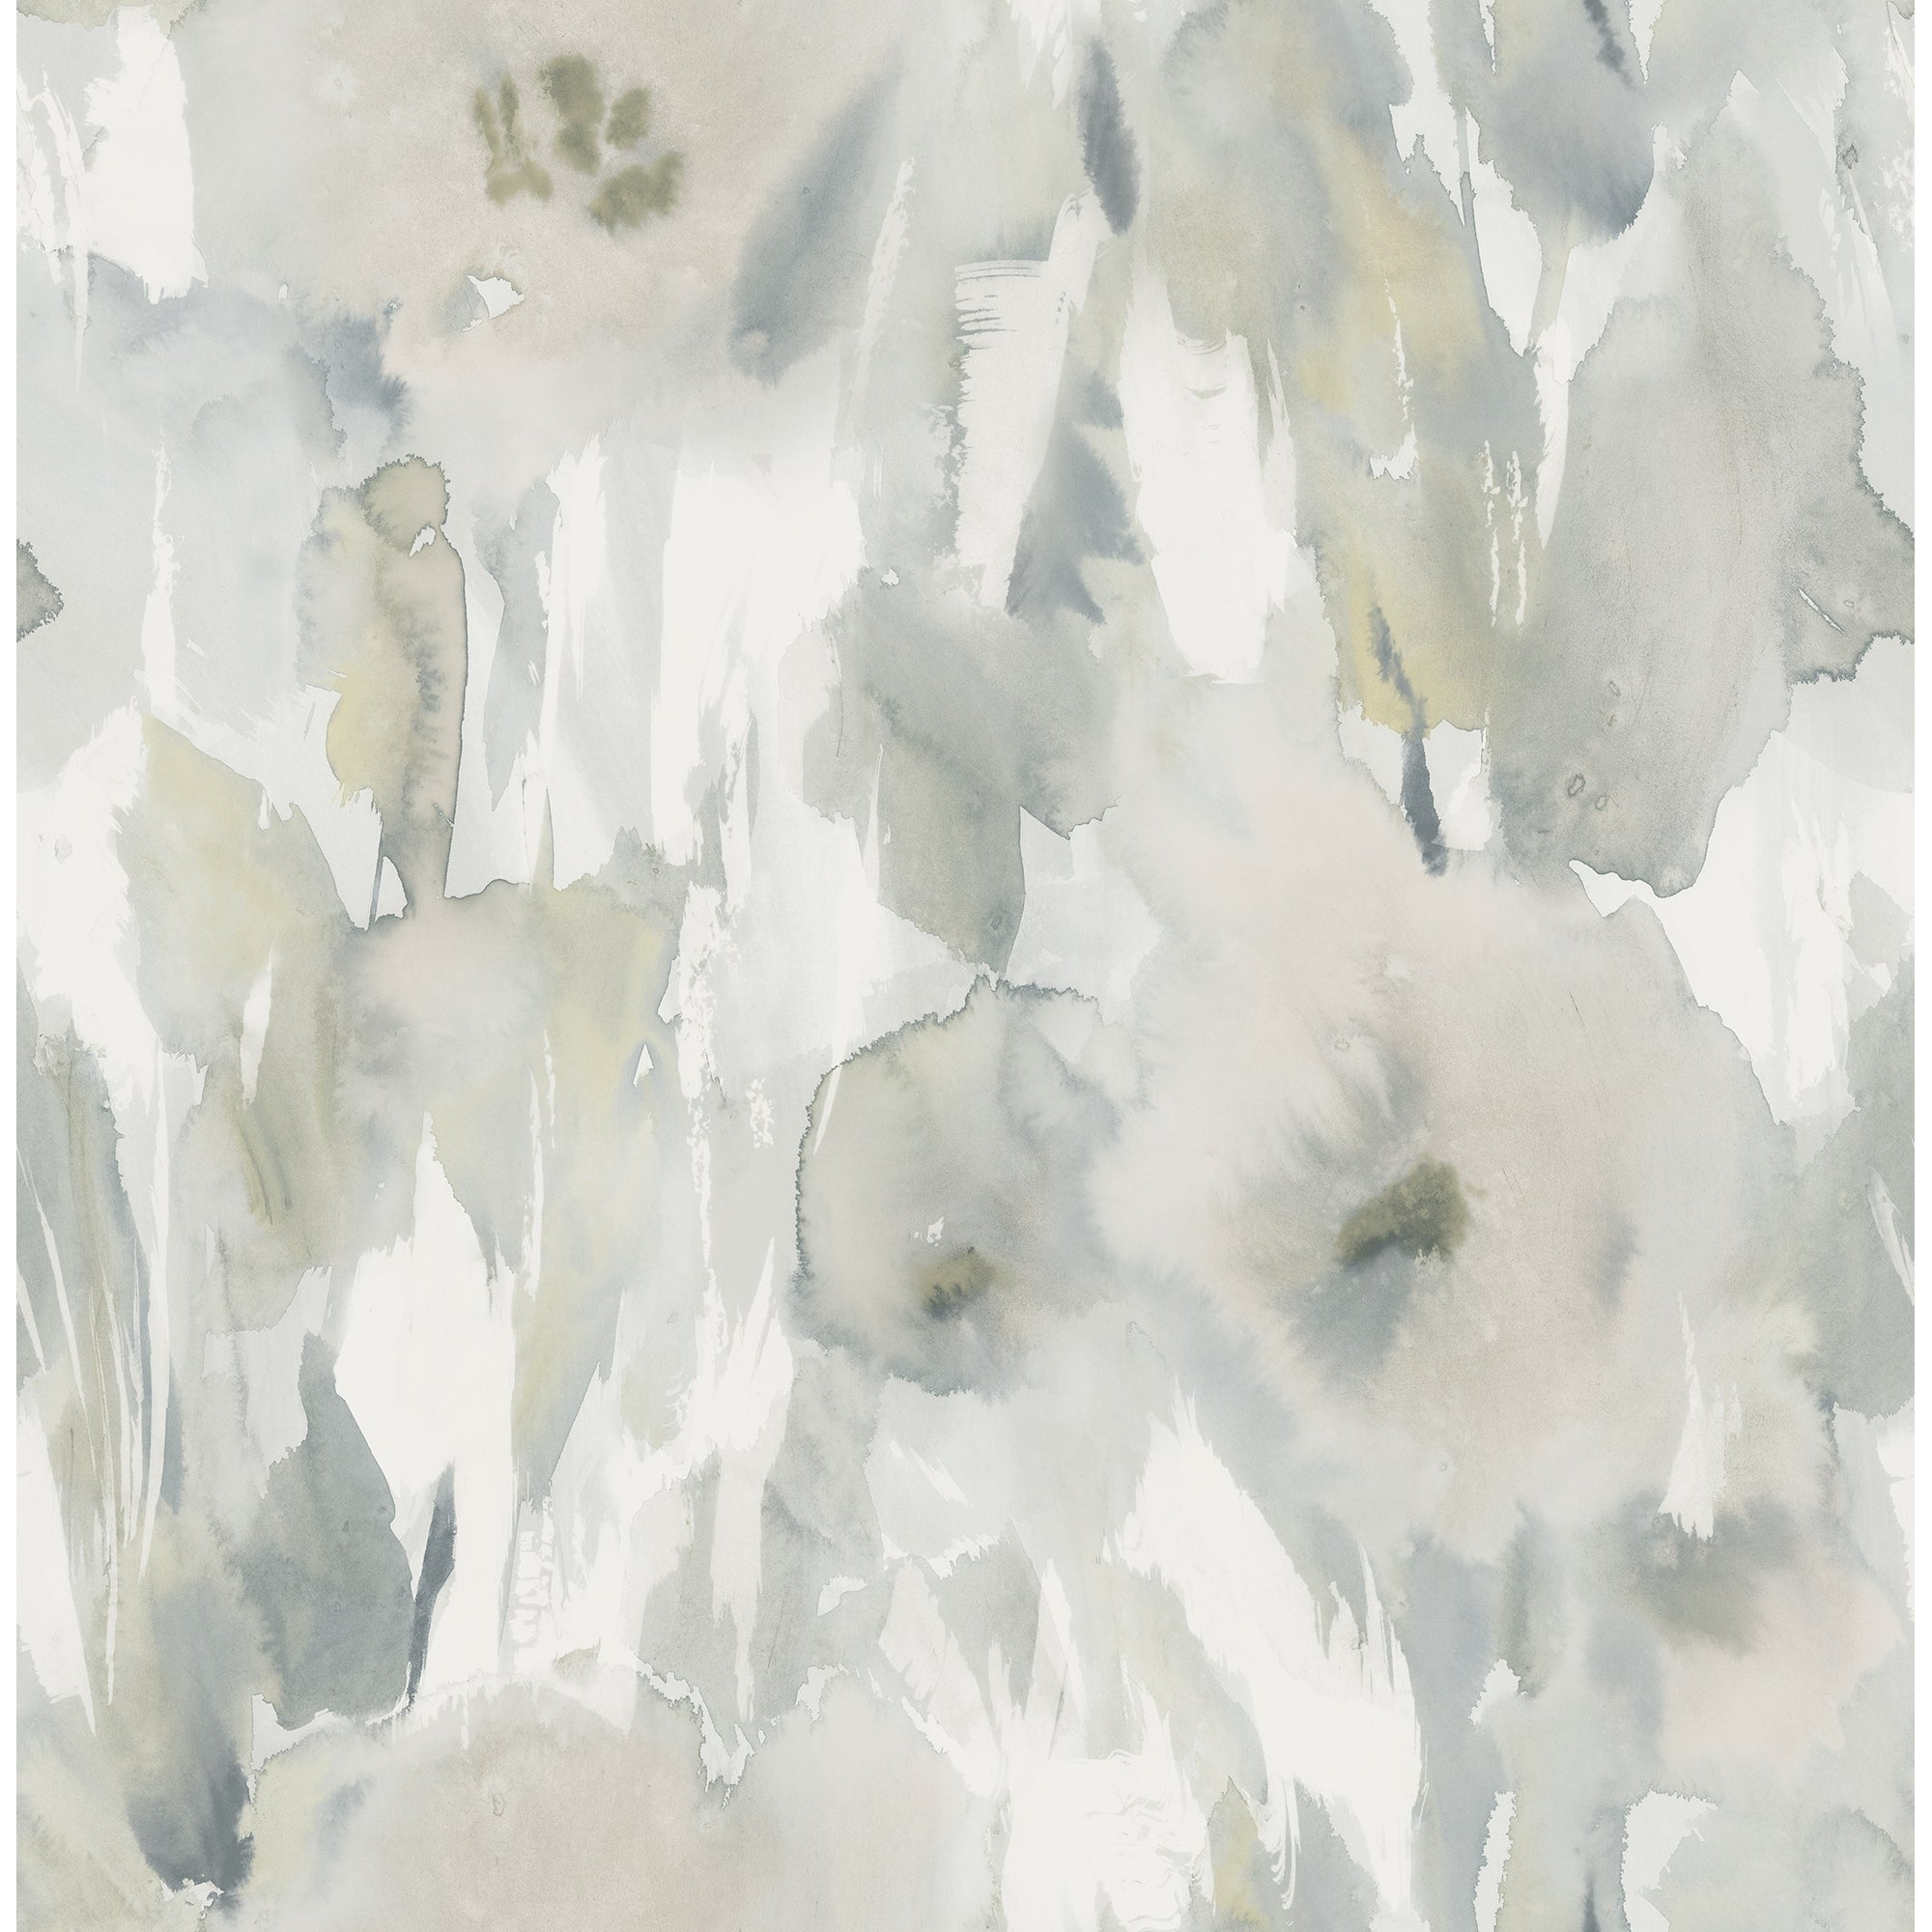 Shop Satin Watercolor Floral Wallpaper 32 81 Feet Long X 20 5